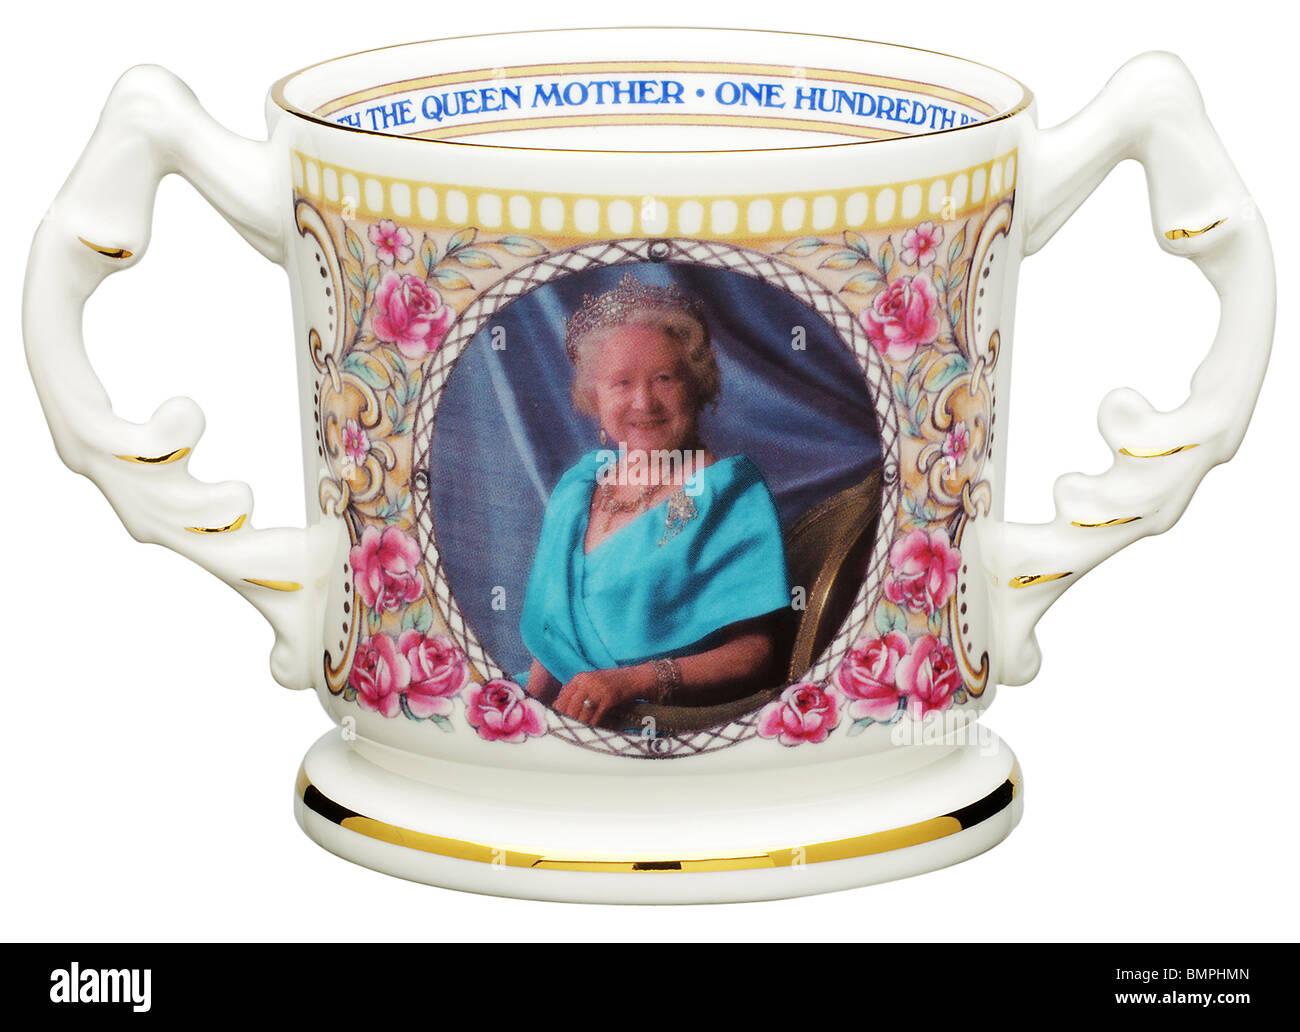 Commemorative mug - Stock Image